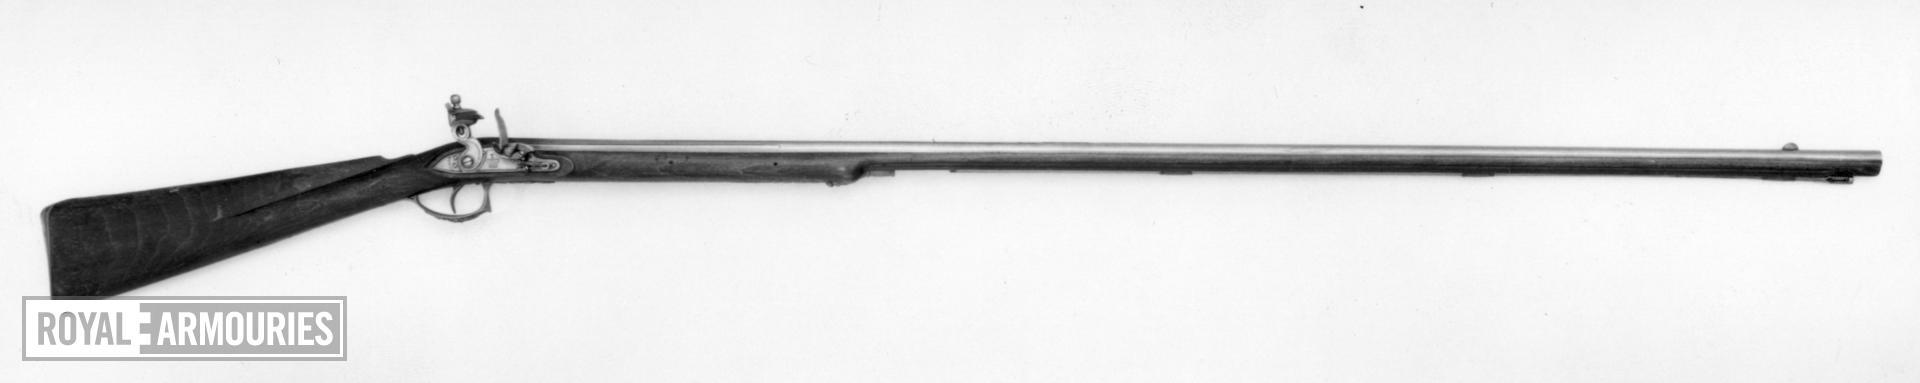 Flintlock musket